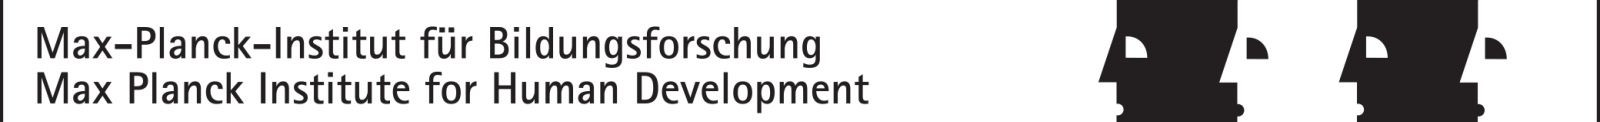 MPIB_Logo_positiv.jpg